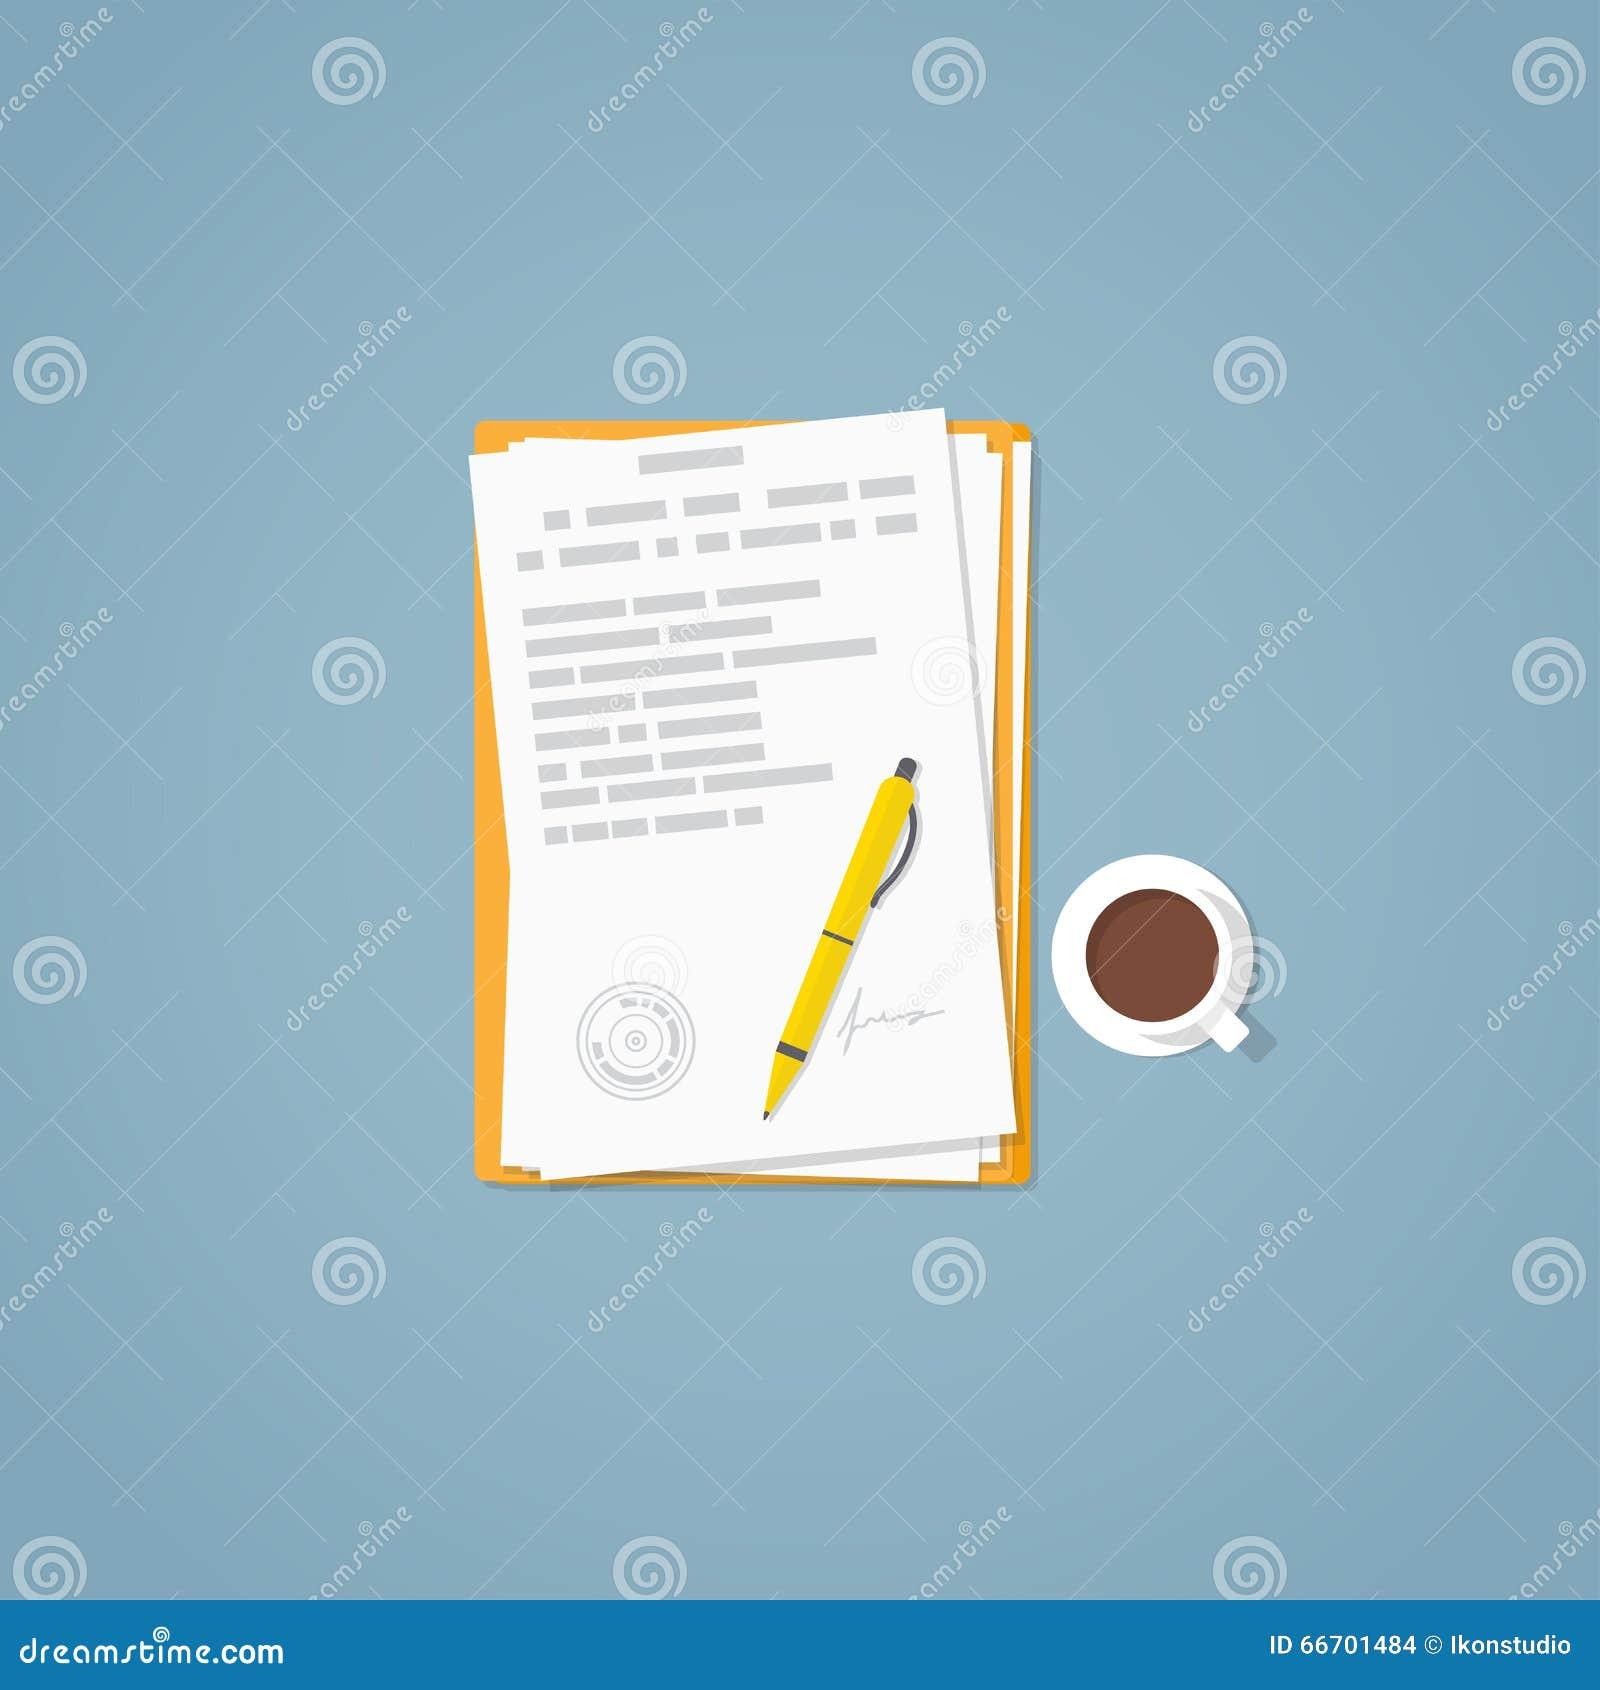 Flat paper document